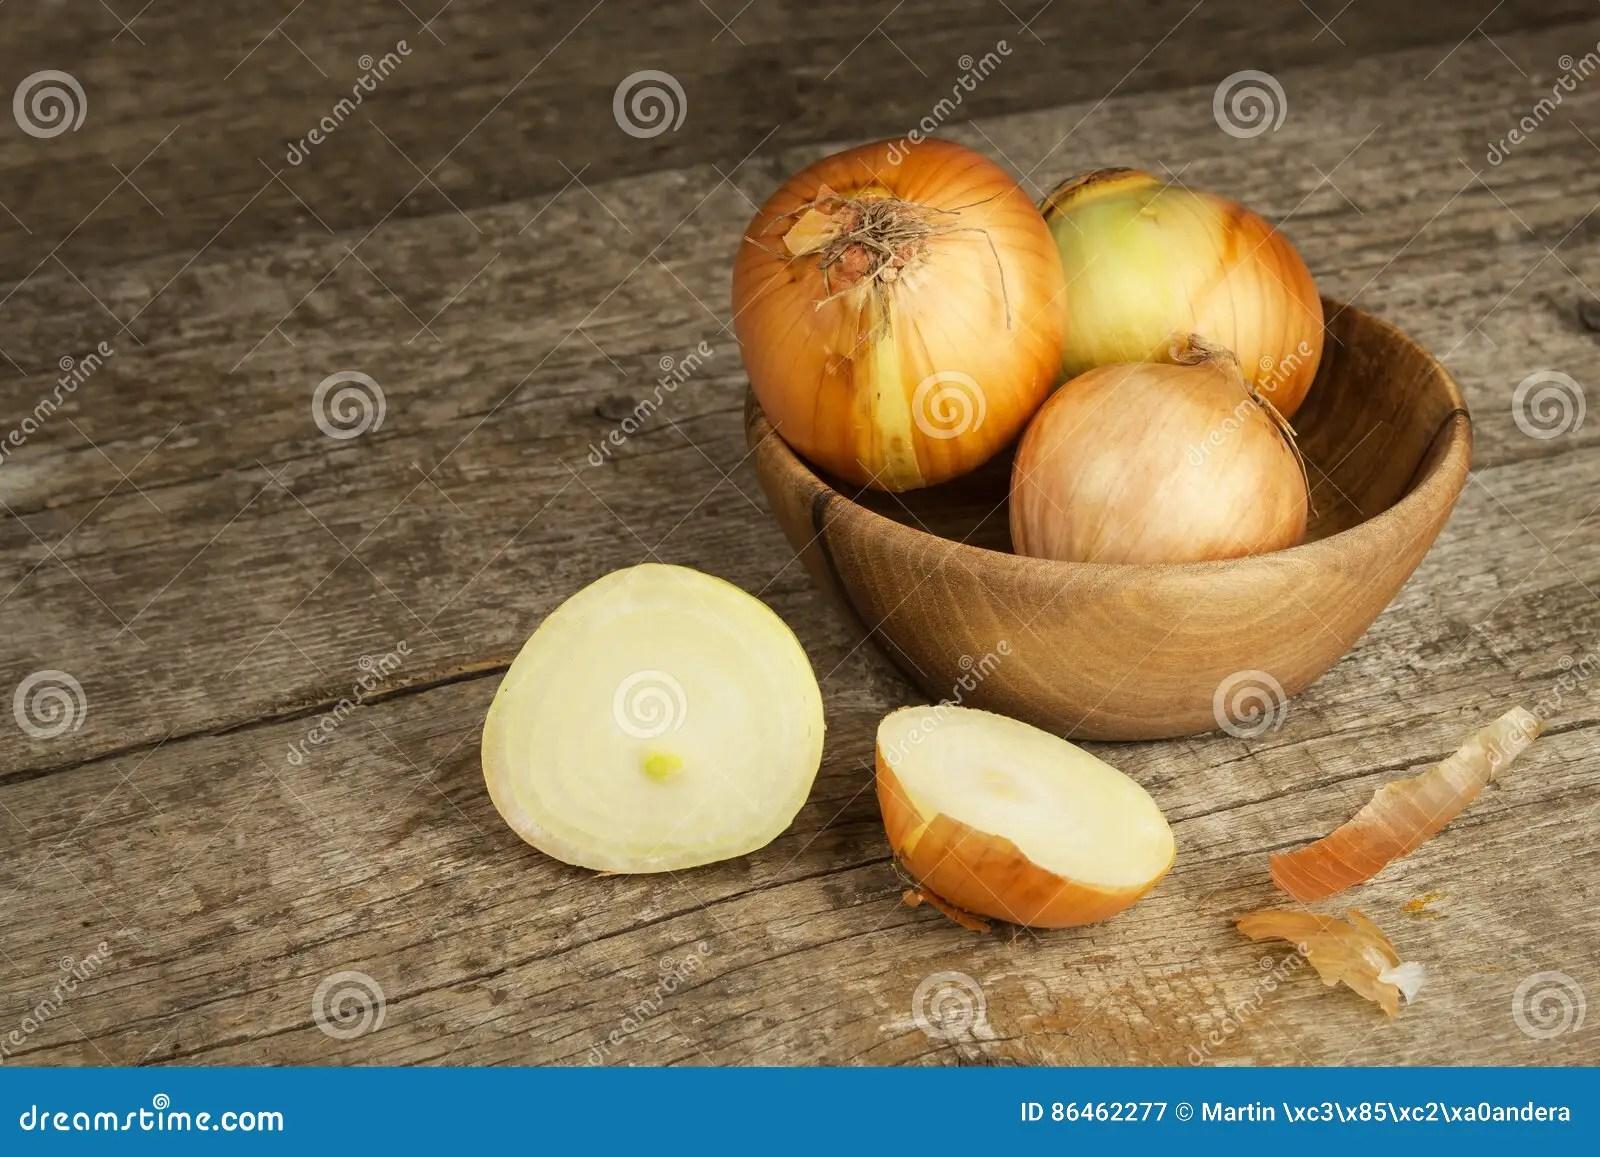 kitchen prep table high quality cabinets 在一张老木桌上的新鲜的葱食物例证厨房准备向量妇女葱切库存图片 图片 在一张老木桌上的新鲜的葱食物例证厨房准备向量妇女葱切